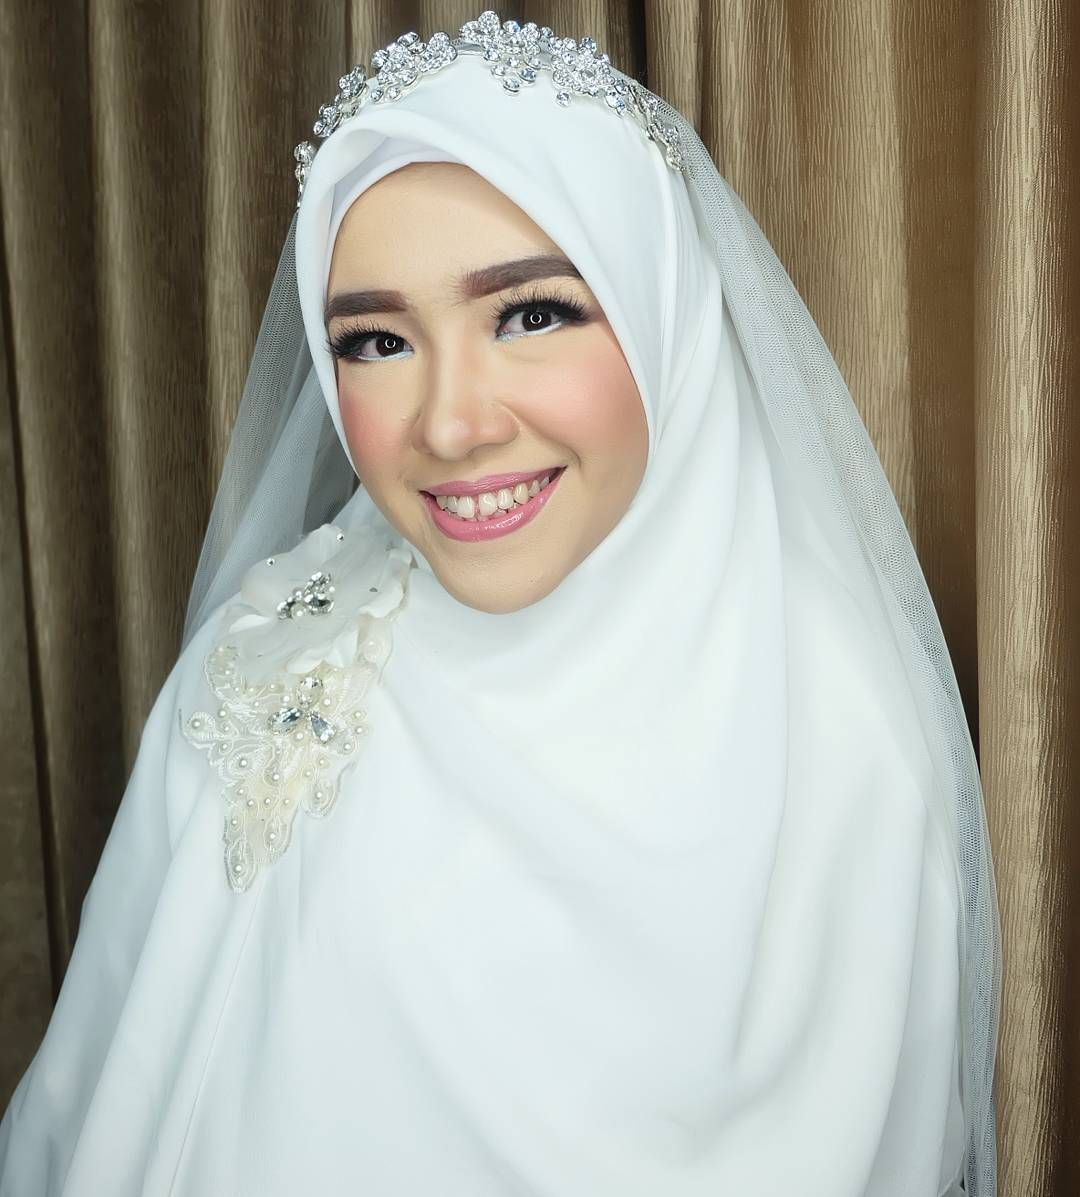 Akad Nikah Novadita Makeup And Hijab Syar I As Requested Wihtout